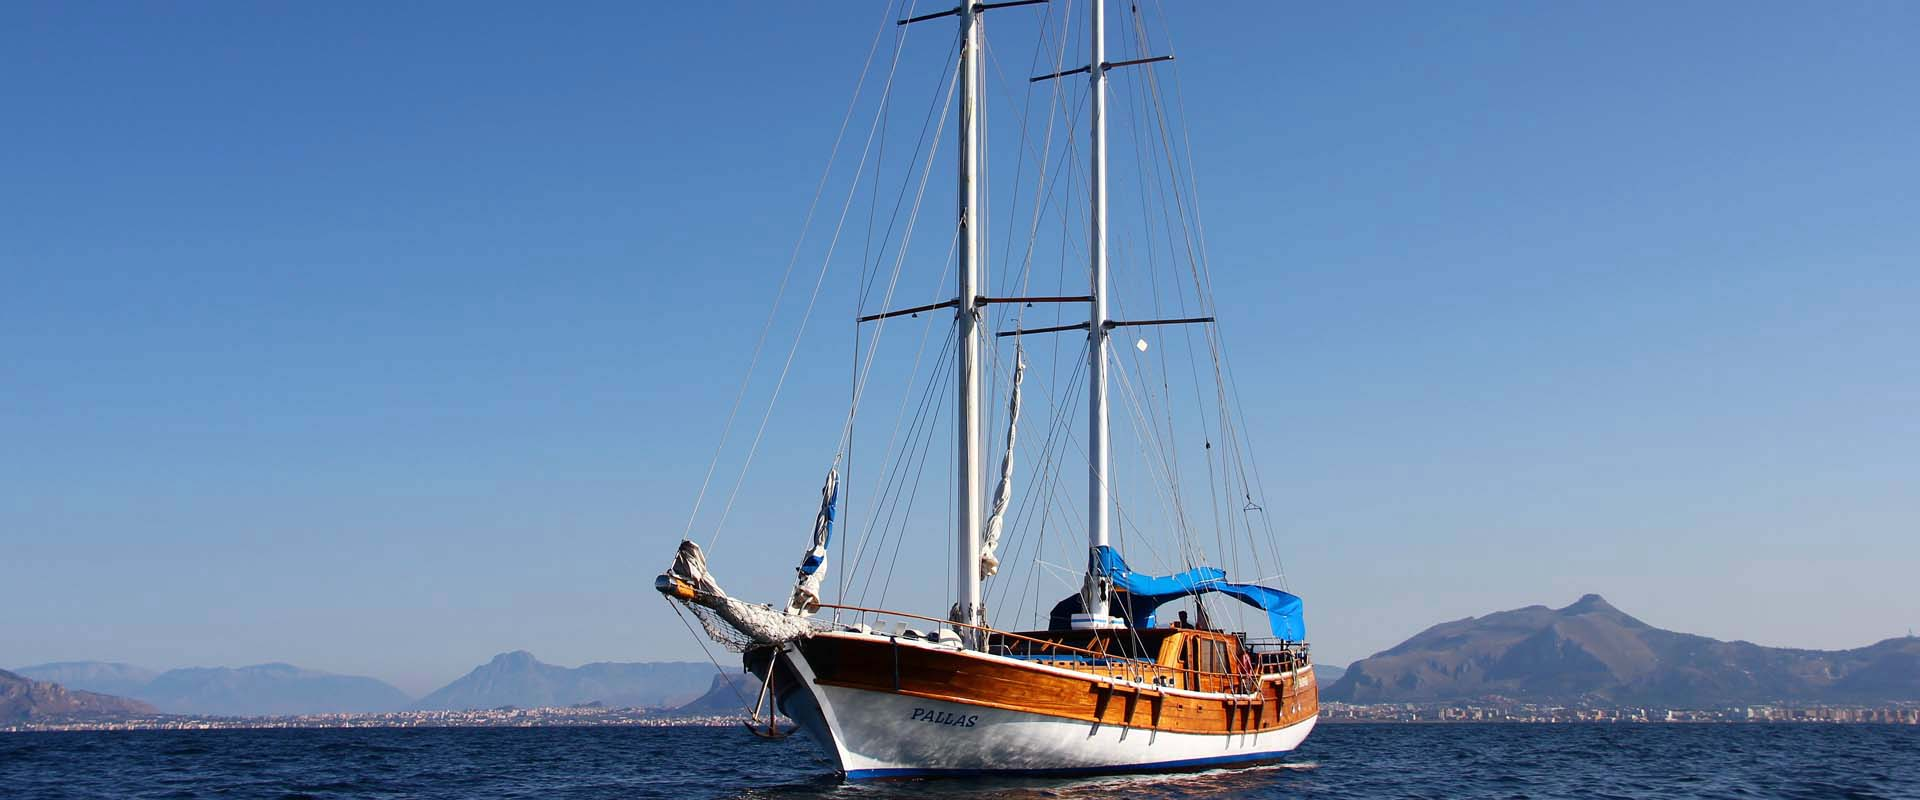 Il Caicco: barca storica e moderno yacht.